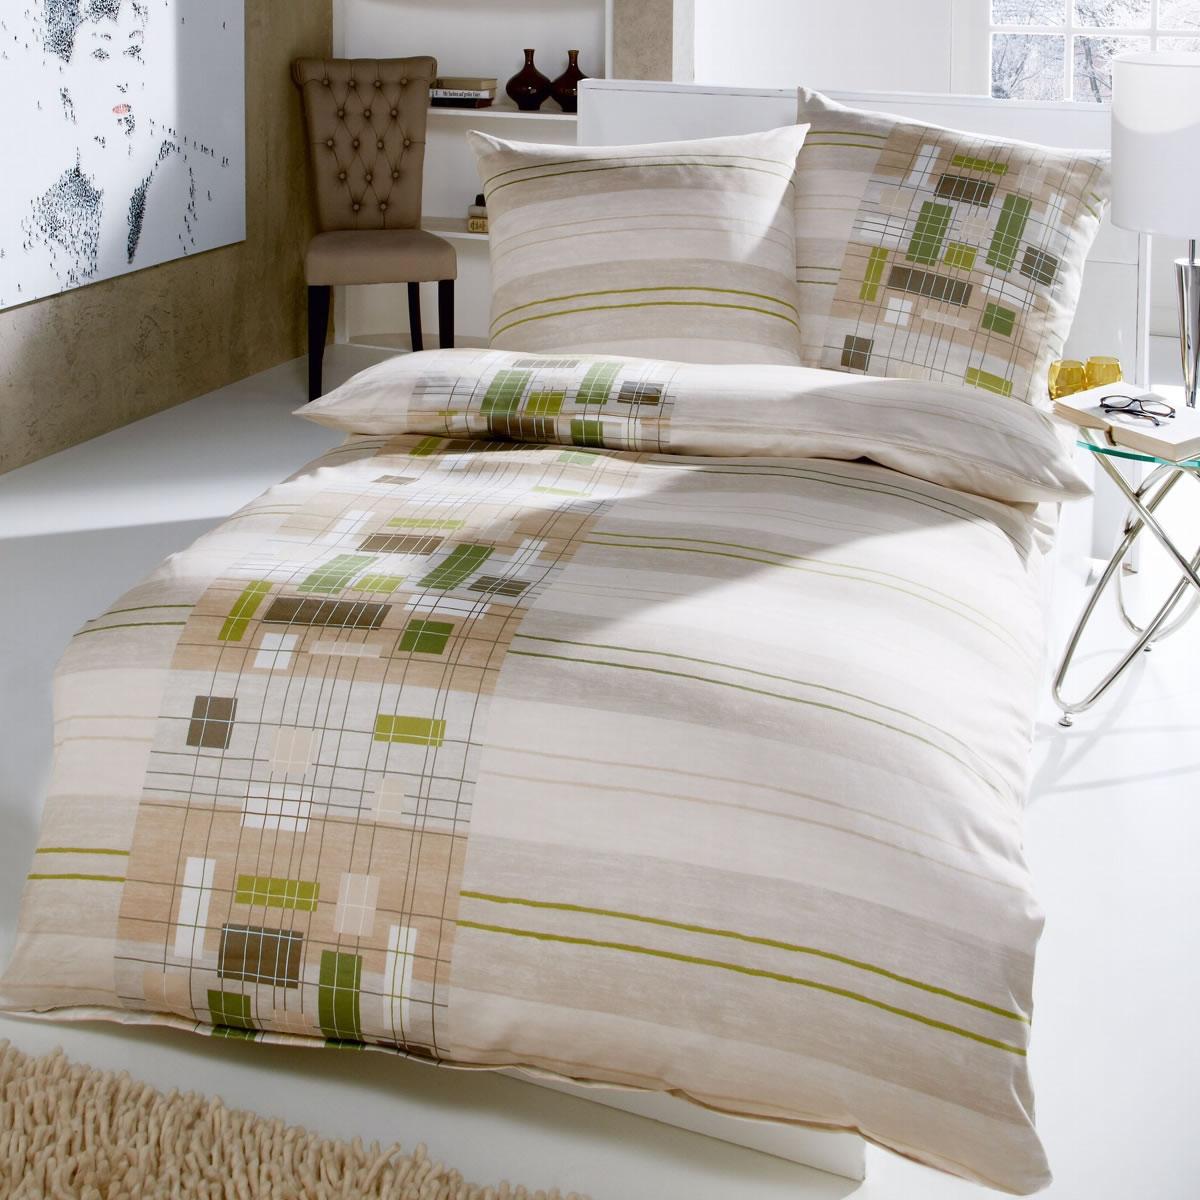 kaeppel microfaser flanell bettw sche 155x220 cm network 43163 khaki. Black Bedroom Furniture Sets. Home Design Ideas